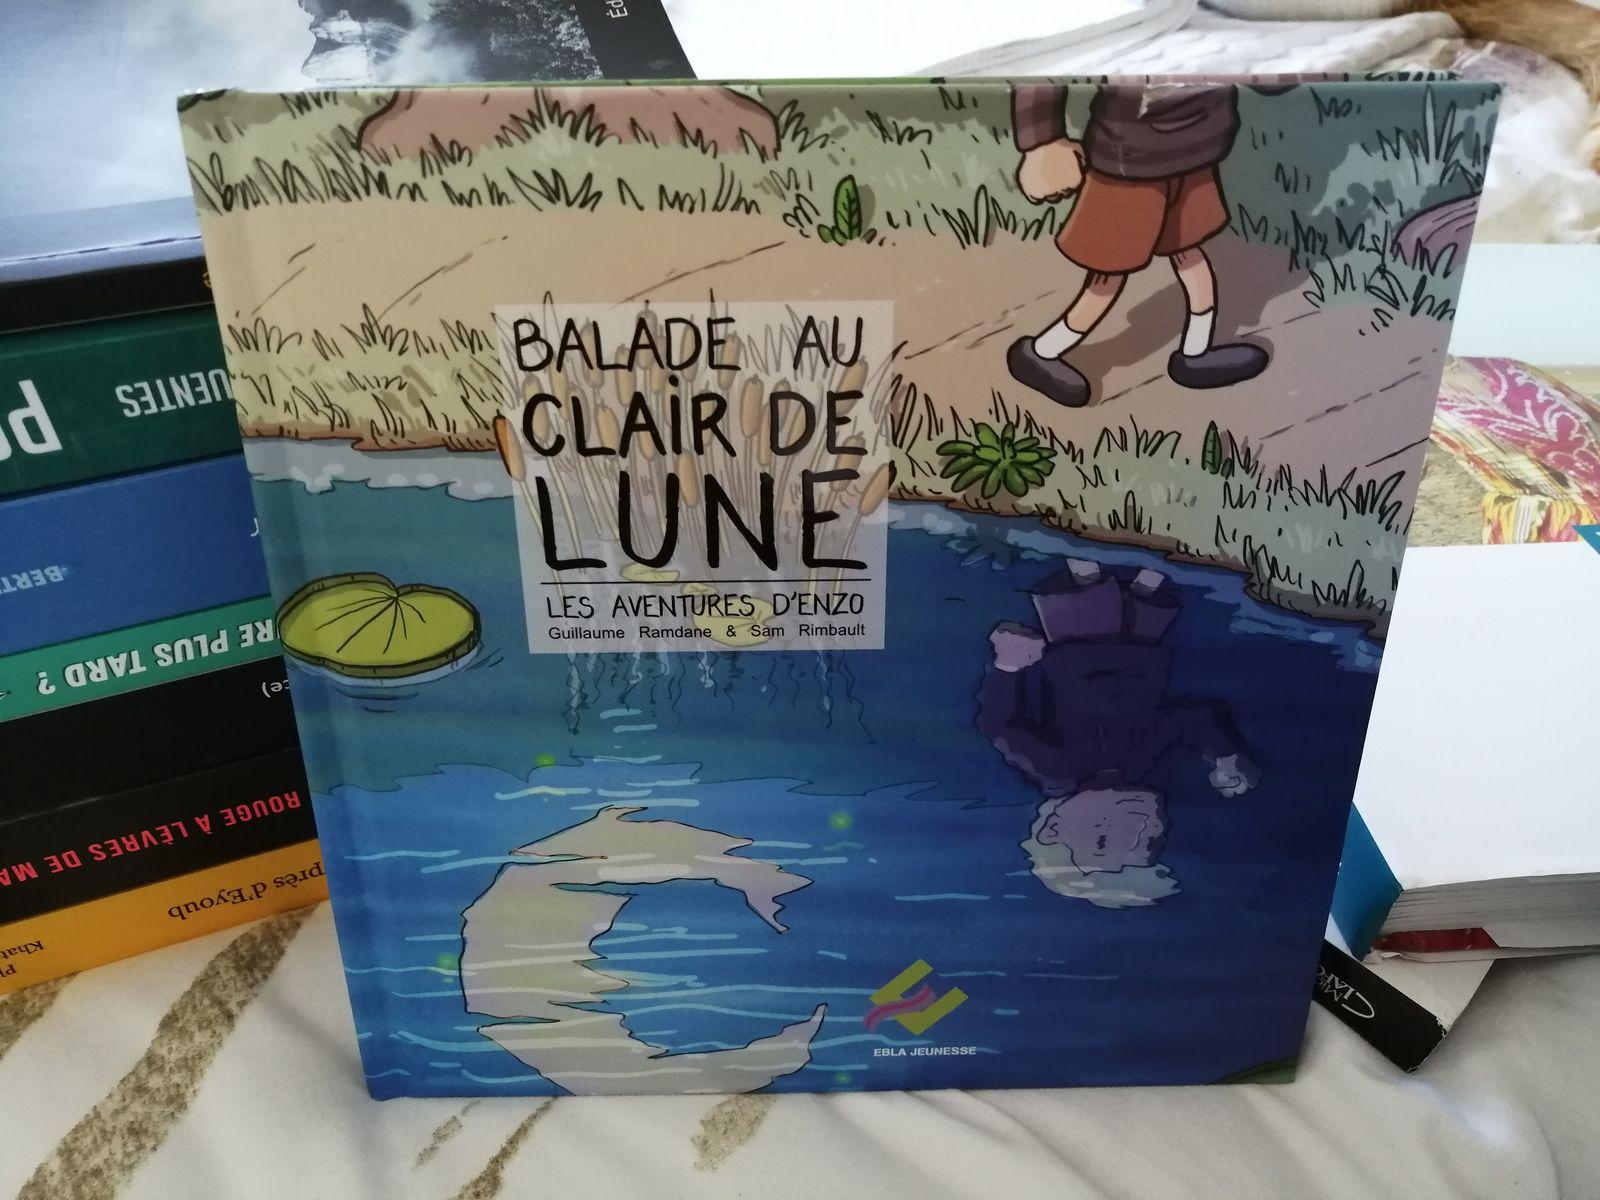 BALADE AU CLAIR DE LUNE de Guillaume Ramdane et Sam Rimbault